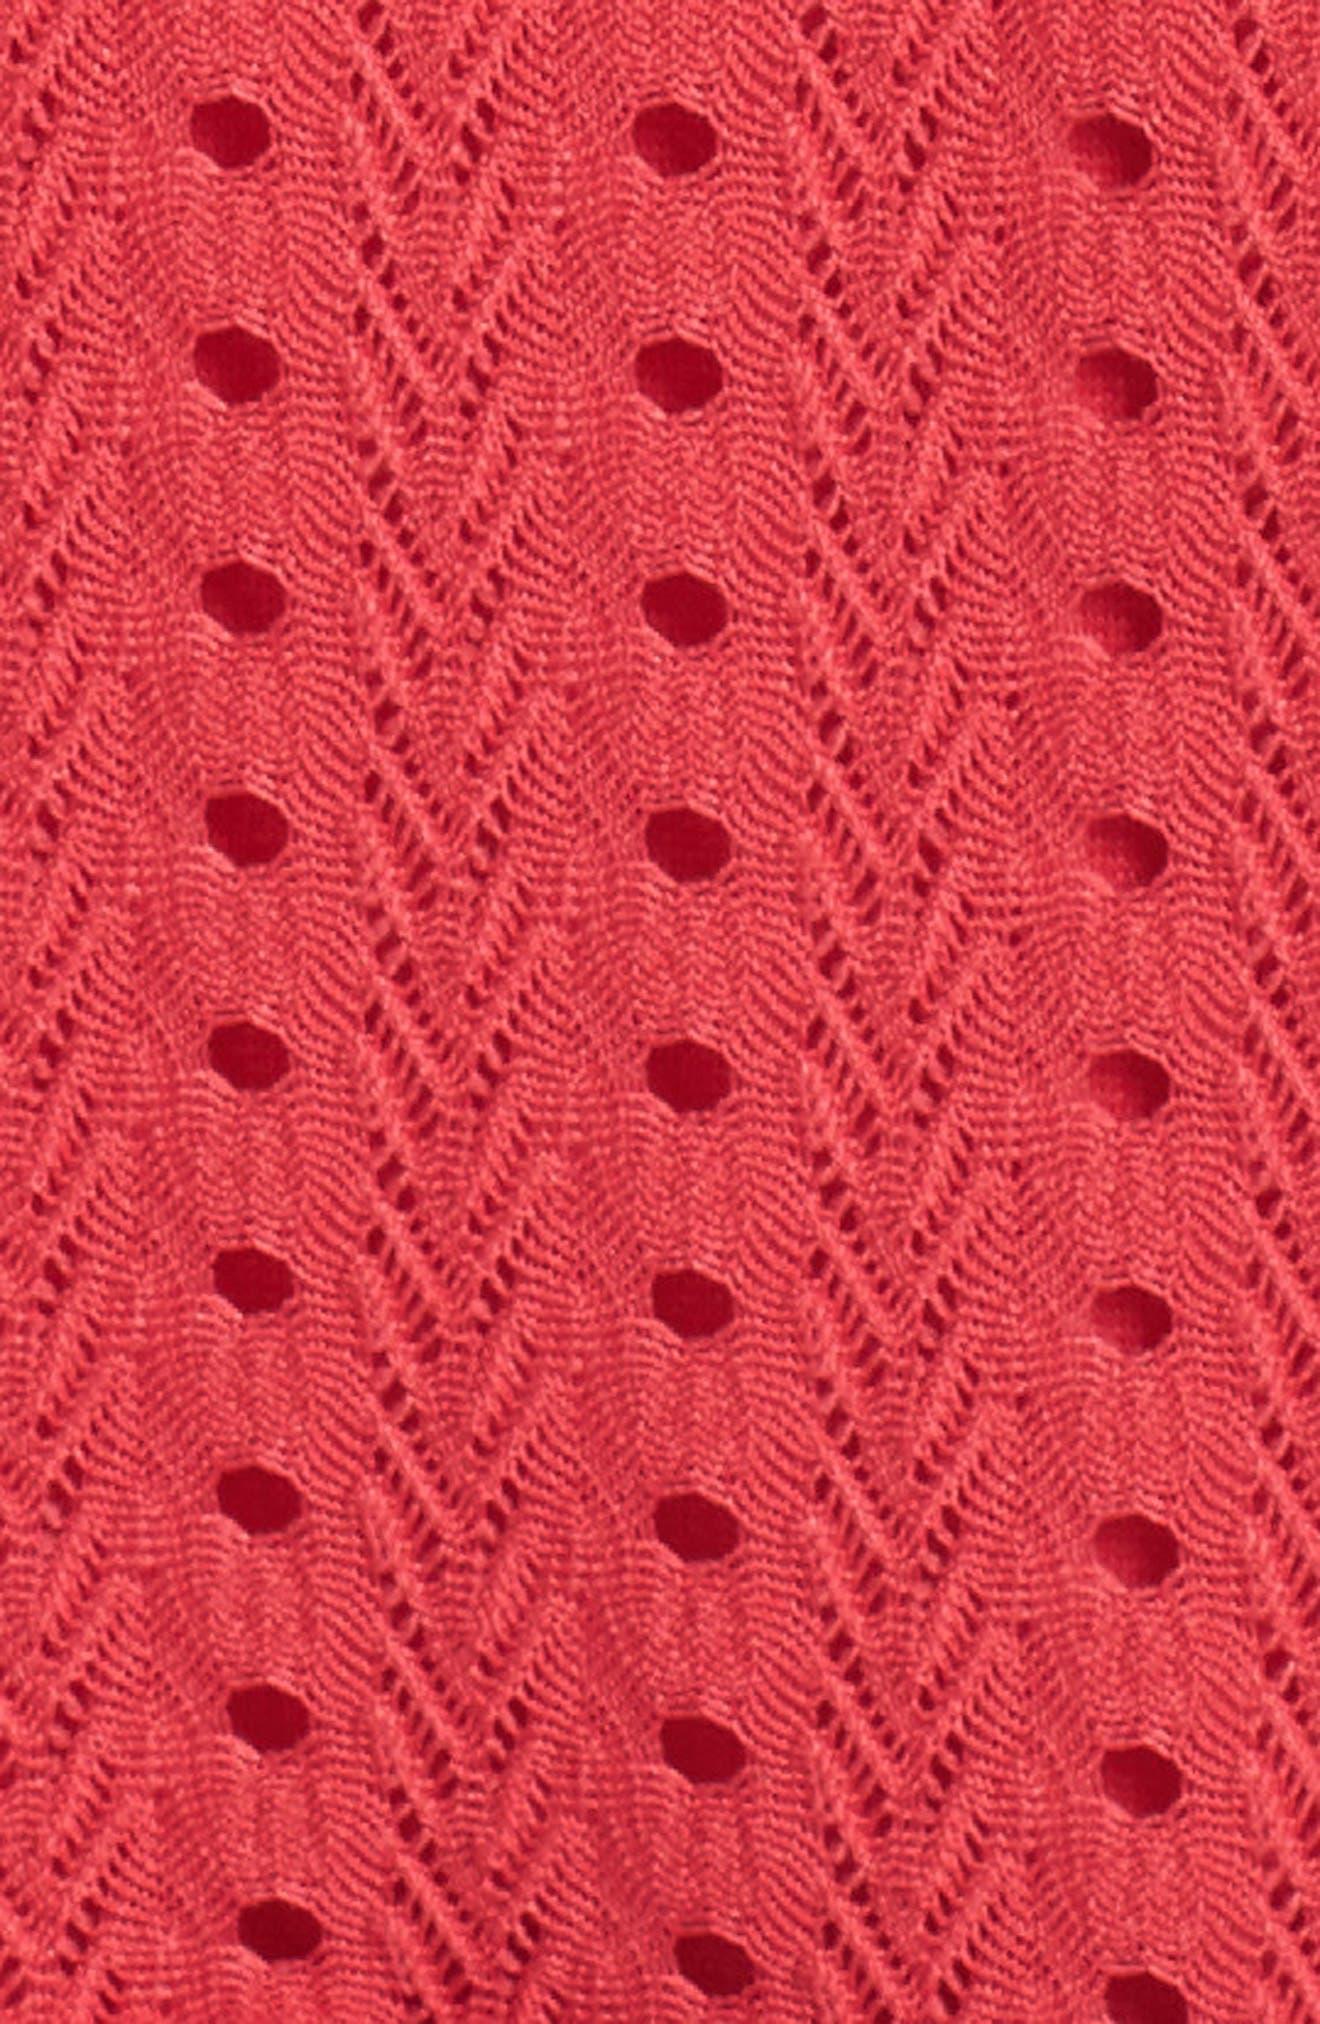 Sleeveless Ruffle Knit Sheath Dress,                             Alternate thumbnail 6, color,                             600